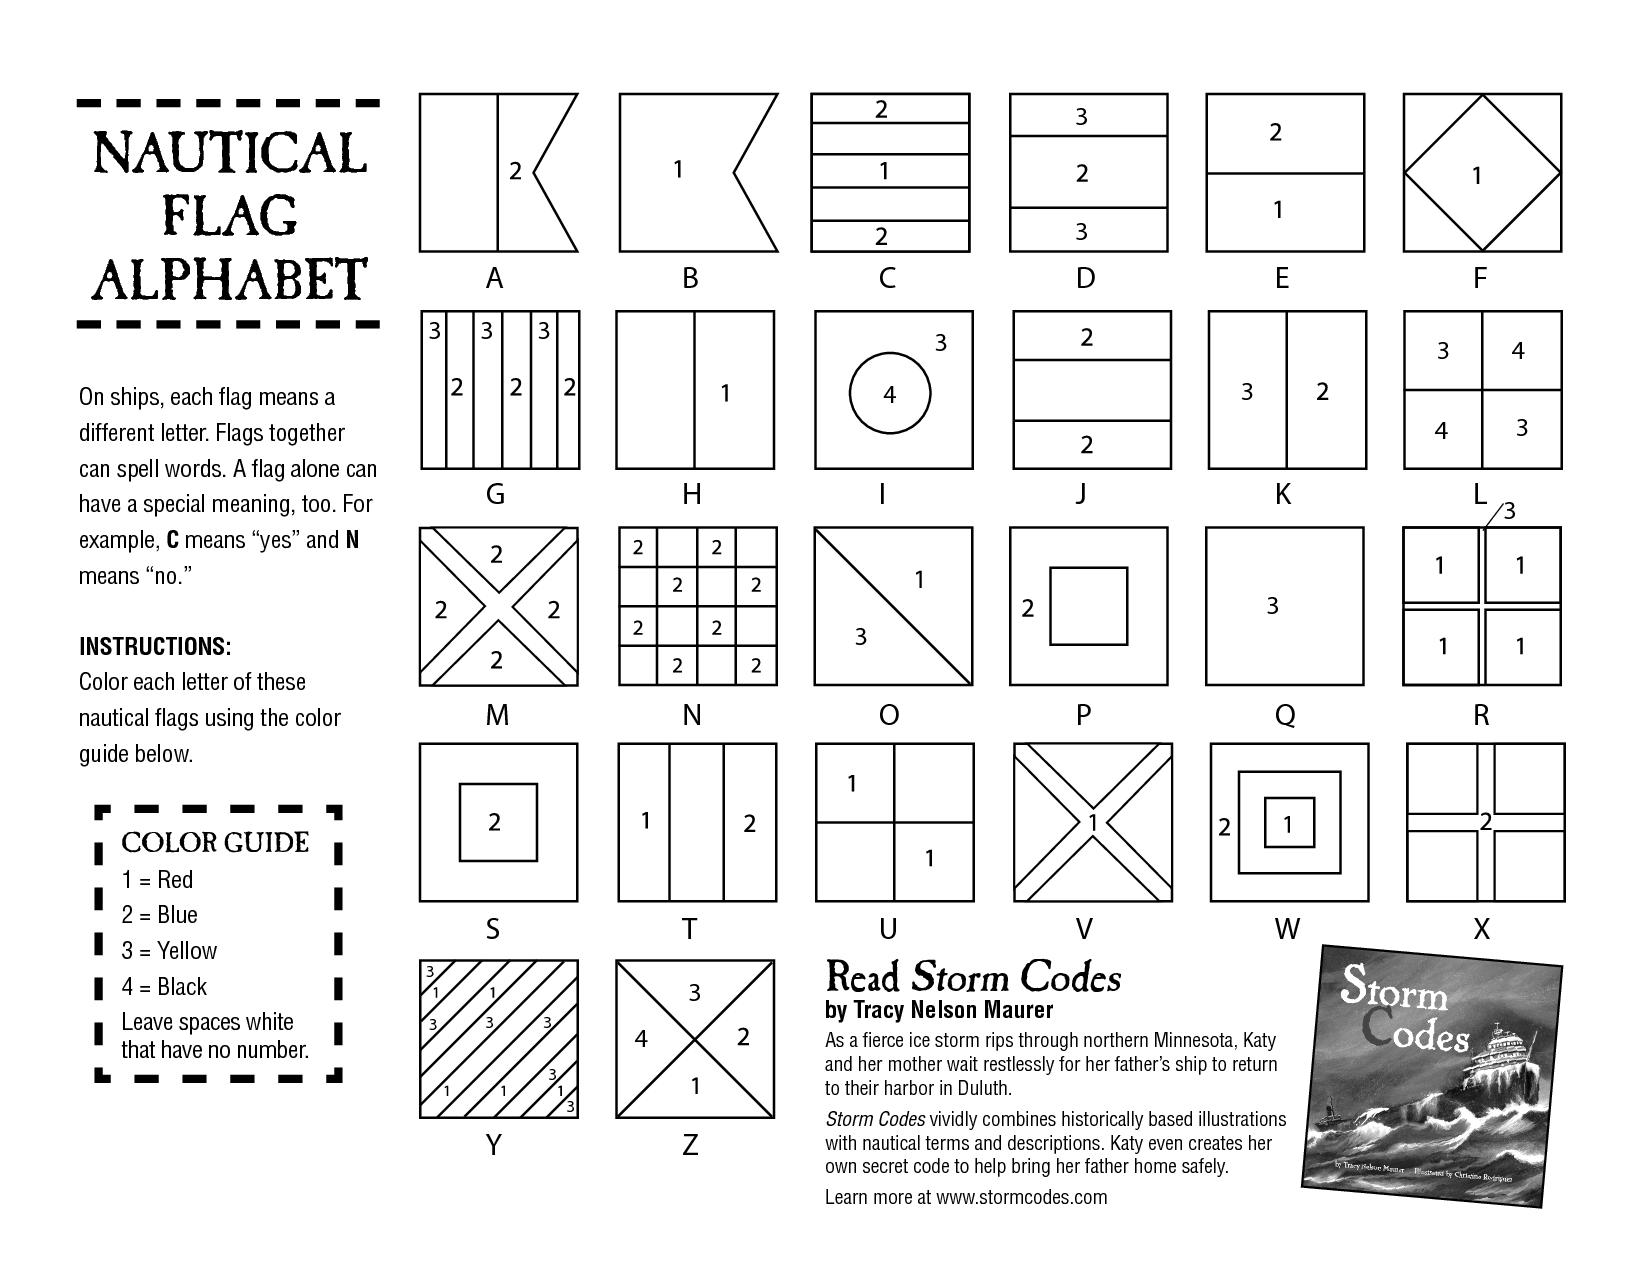 Nautical Flags Coloring Sheet